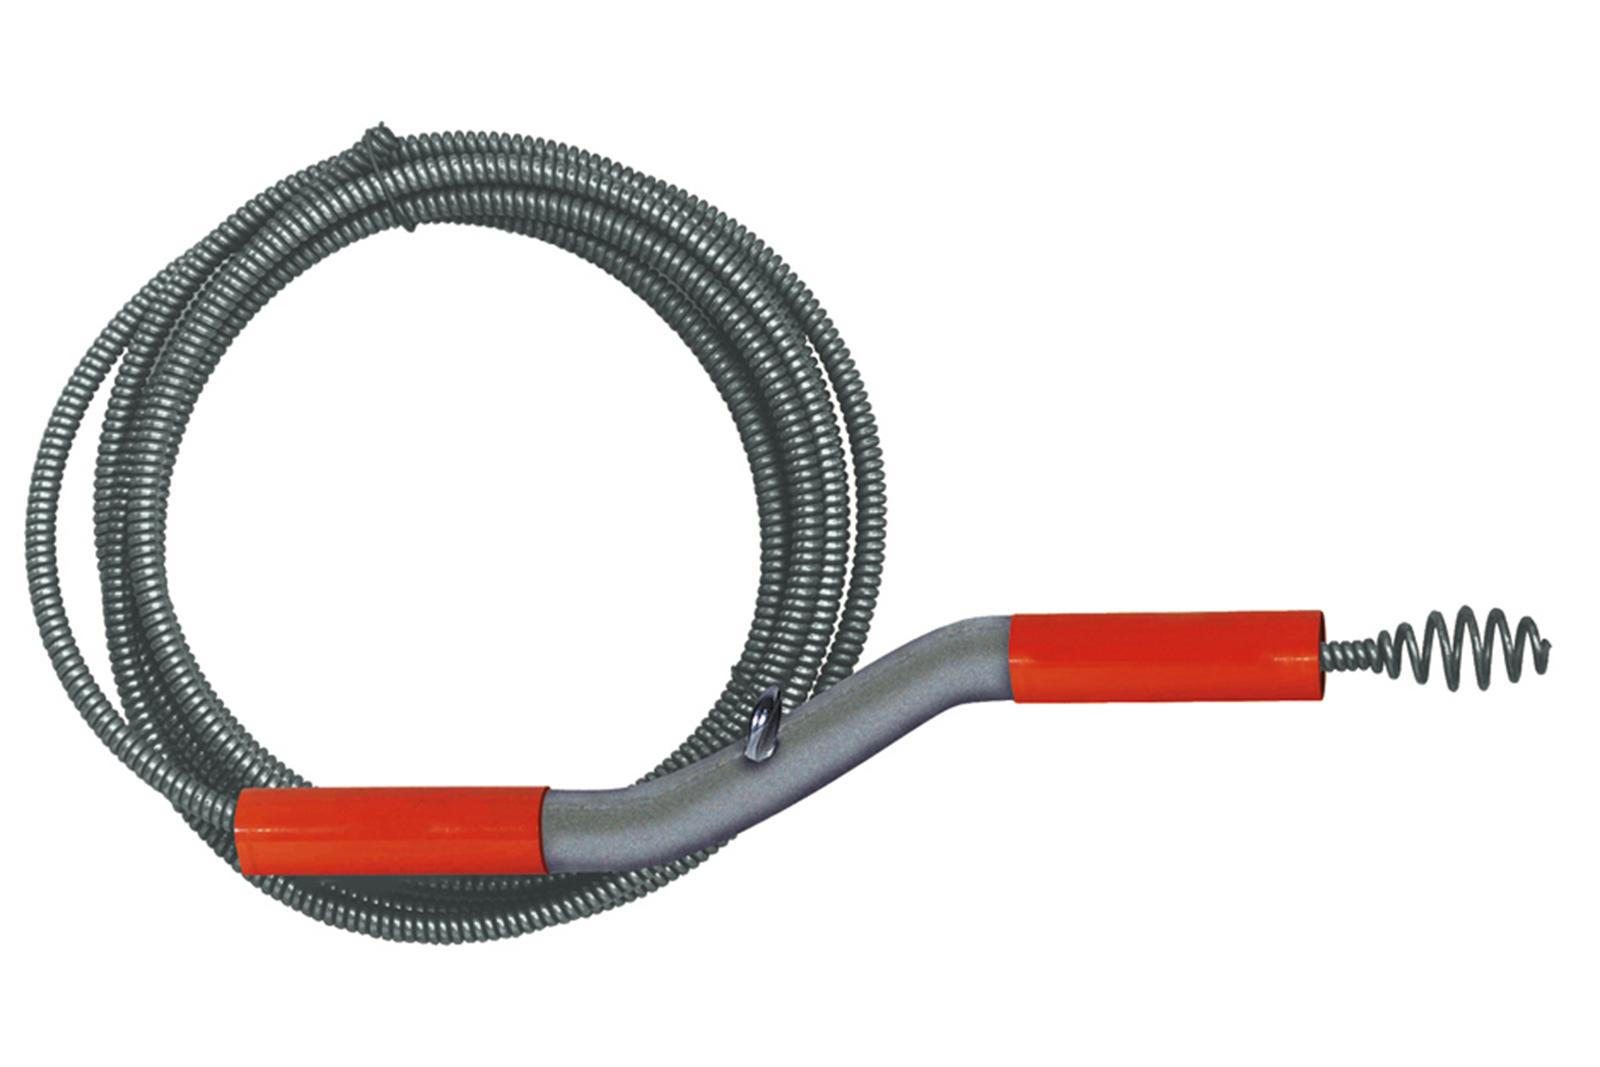 Трос для прочистки General pipe 25fl1-ddh